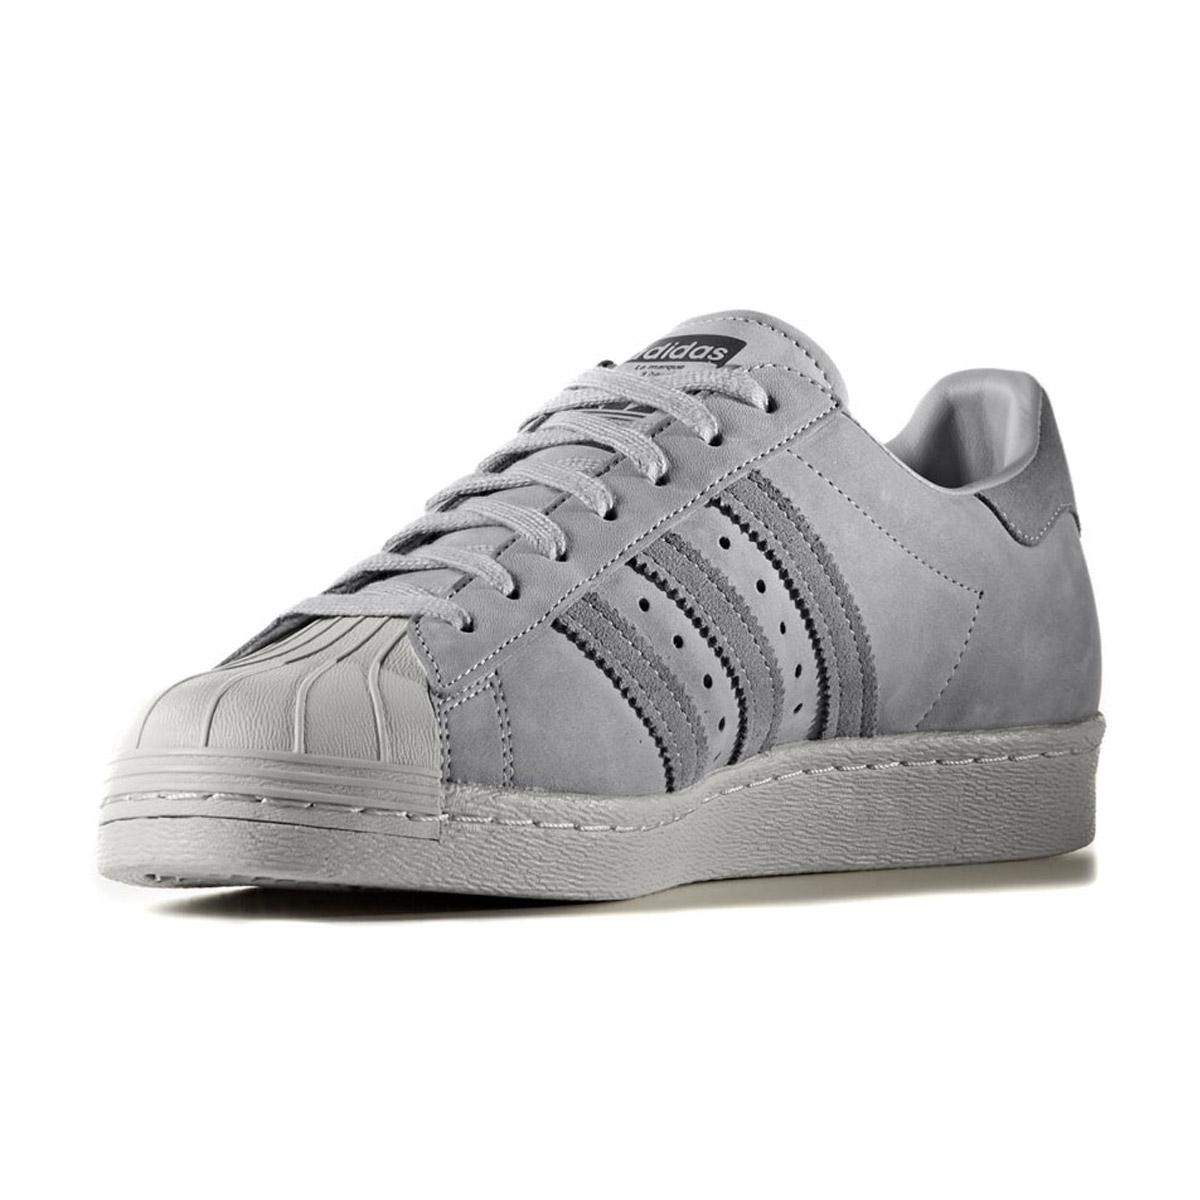 adidas superstar 80s trainers mid grey three grey